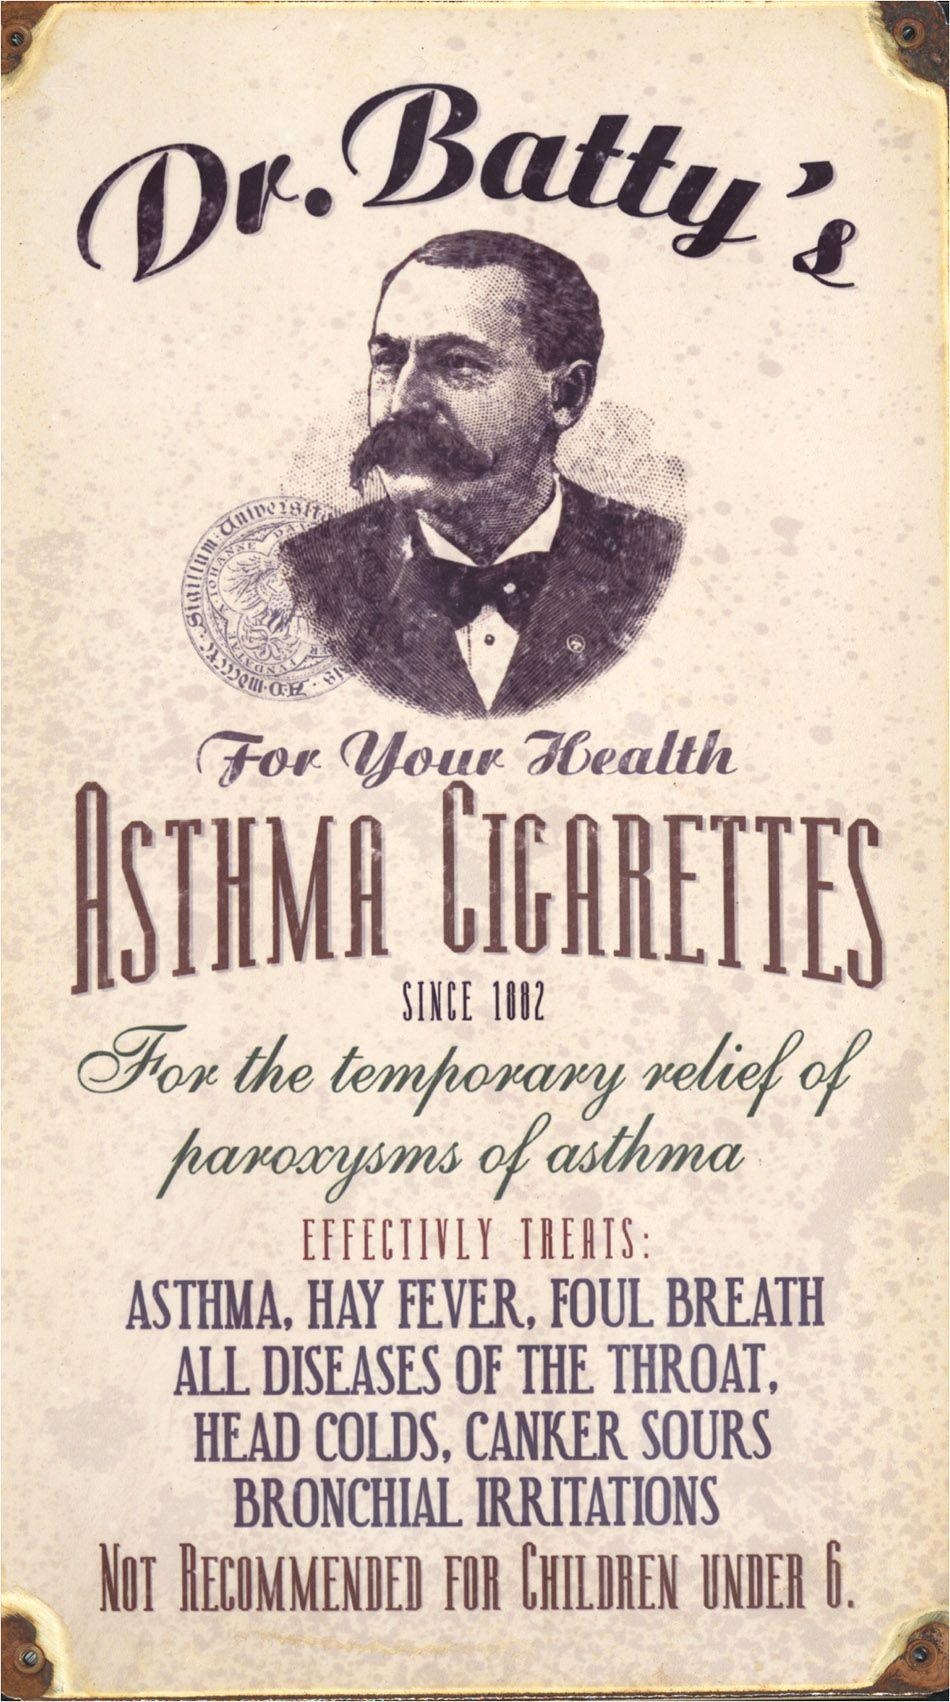 Asthma cigarettes, not for children under 6........